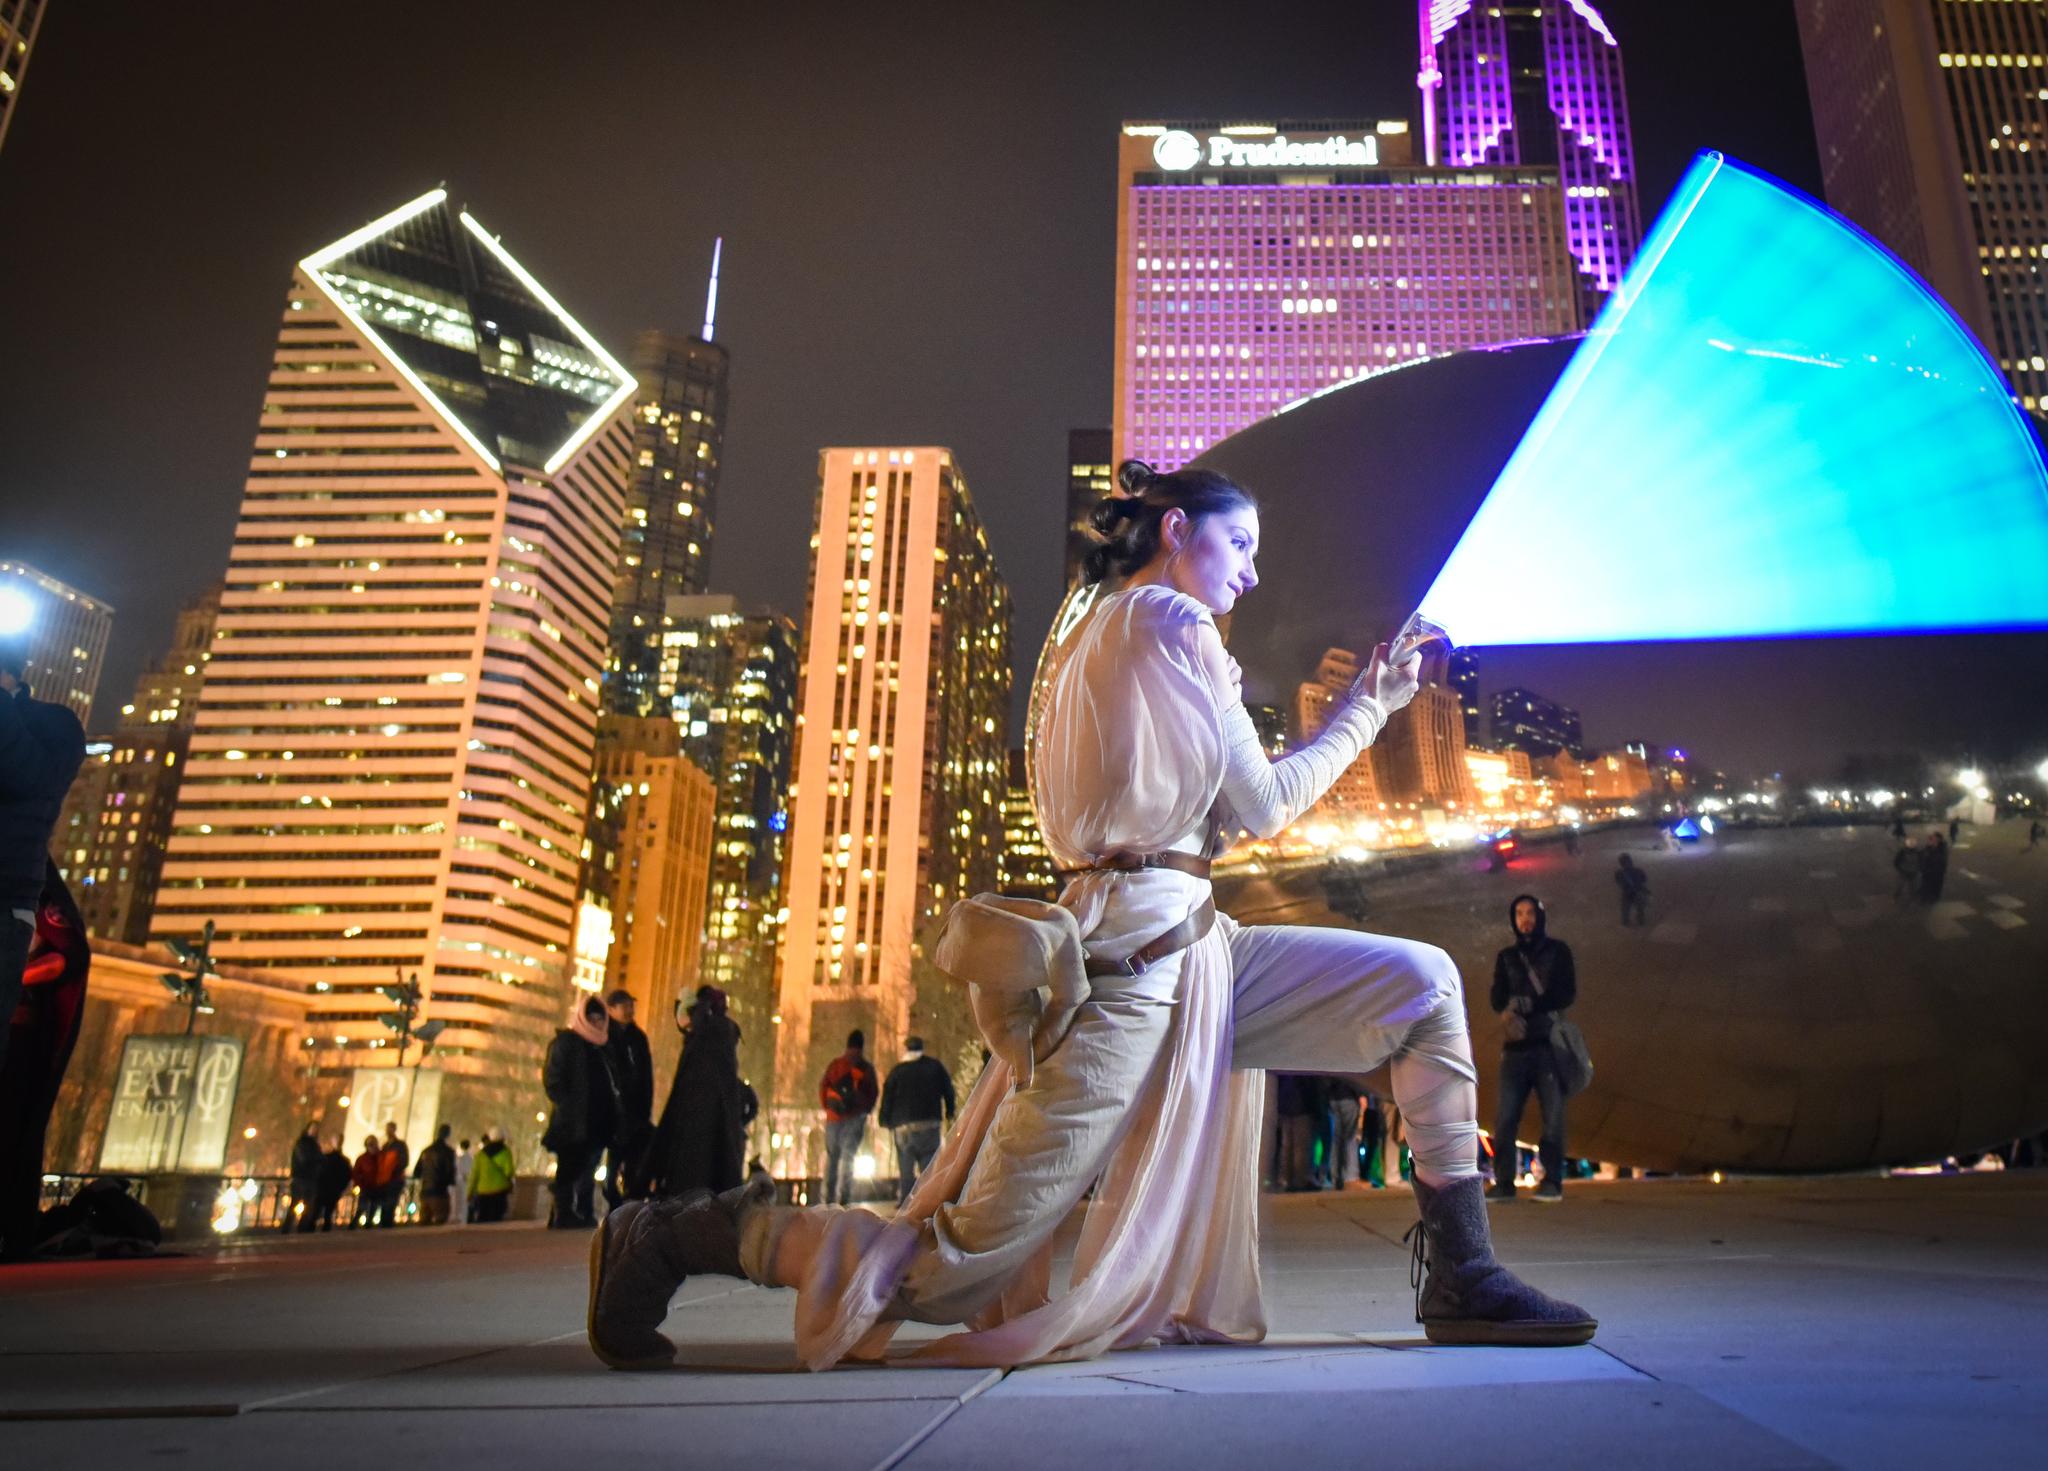 2019.04.14 - Star Wars Celebration Chicago 288911.JPG